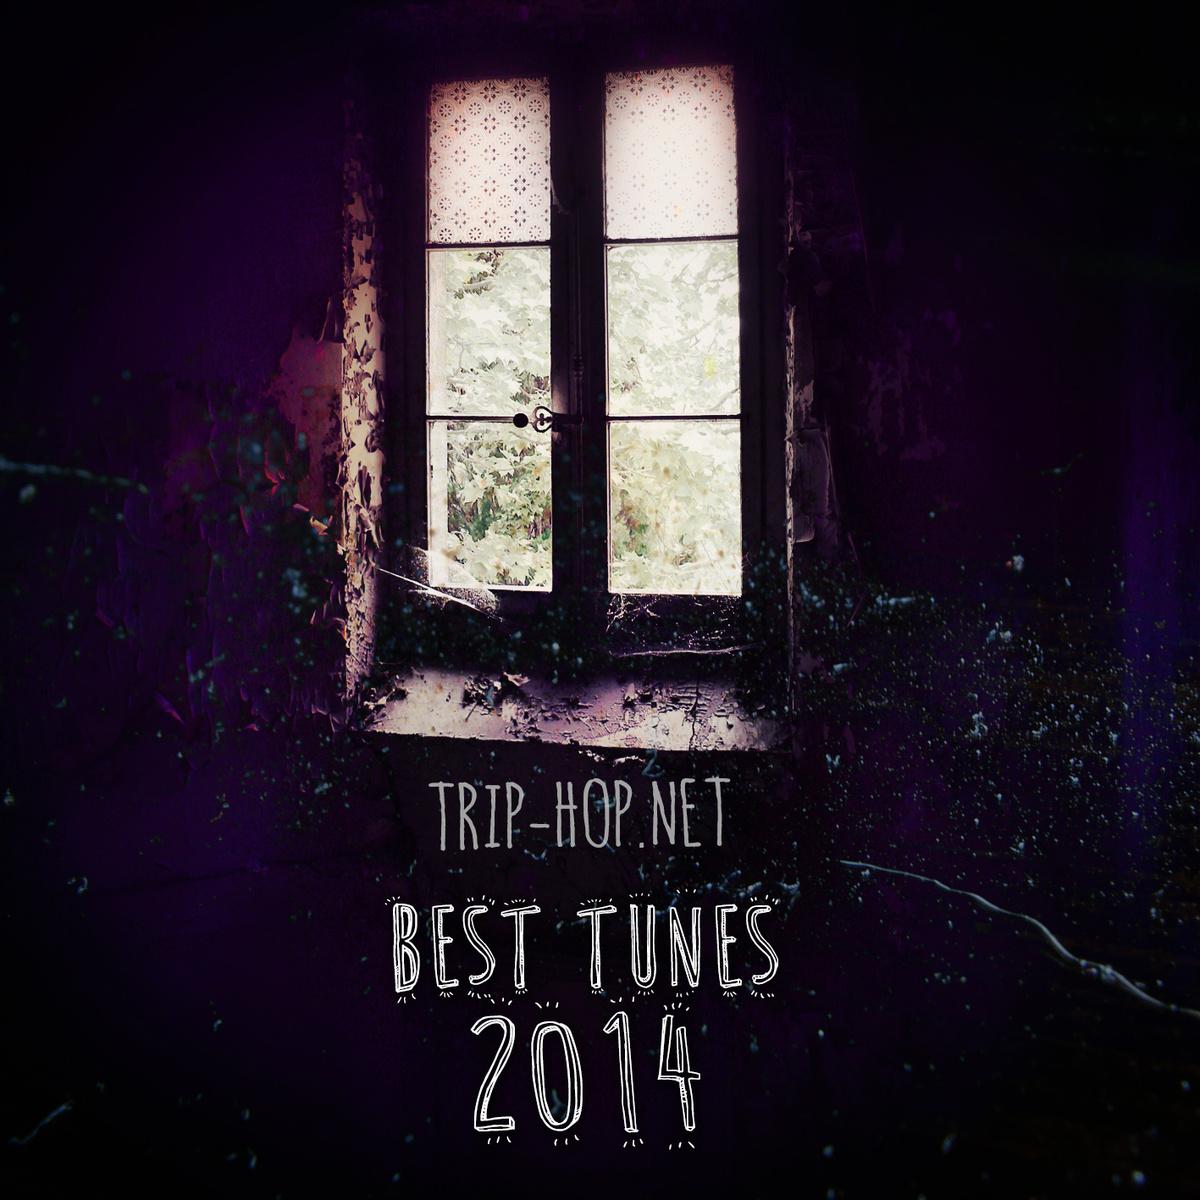 Trip-Hop.net Best Tunes 2014